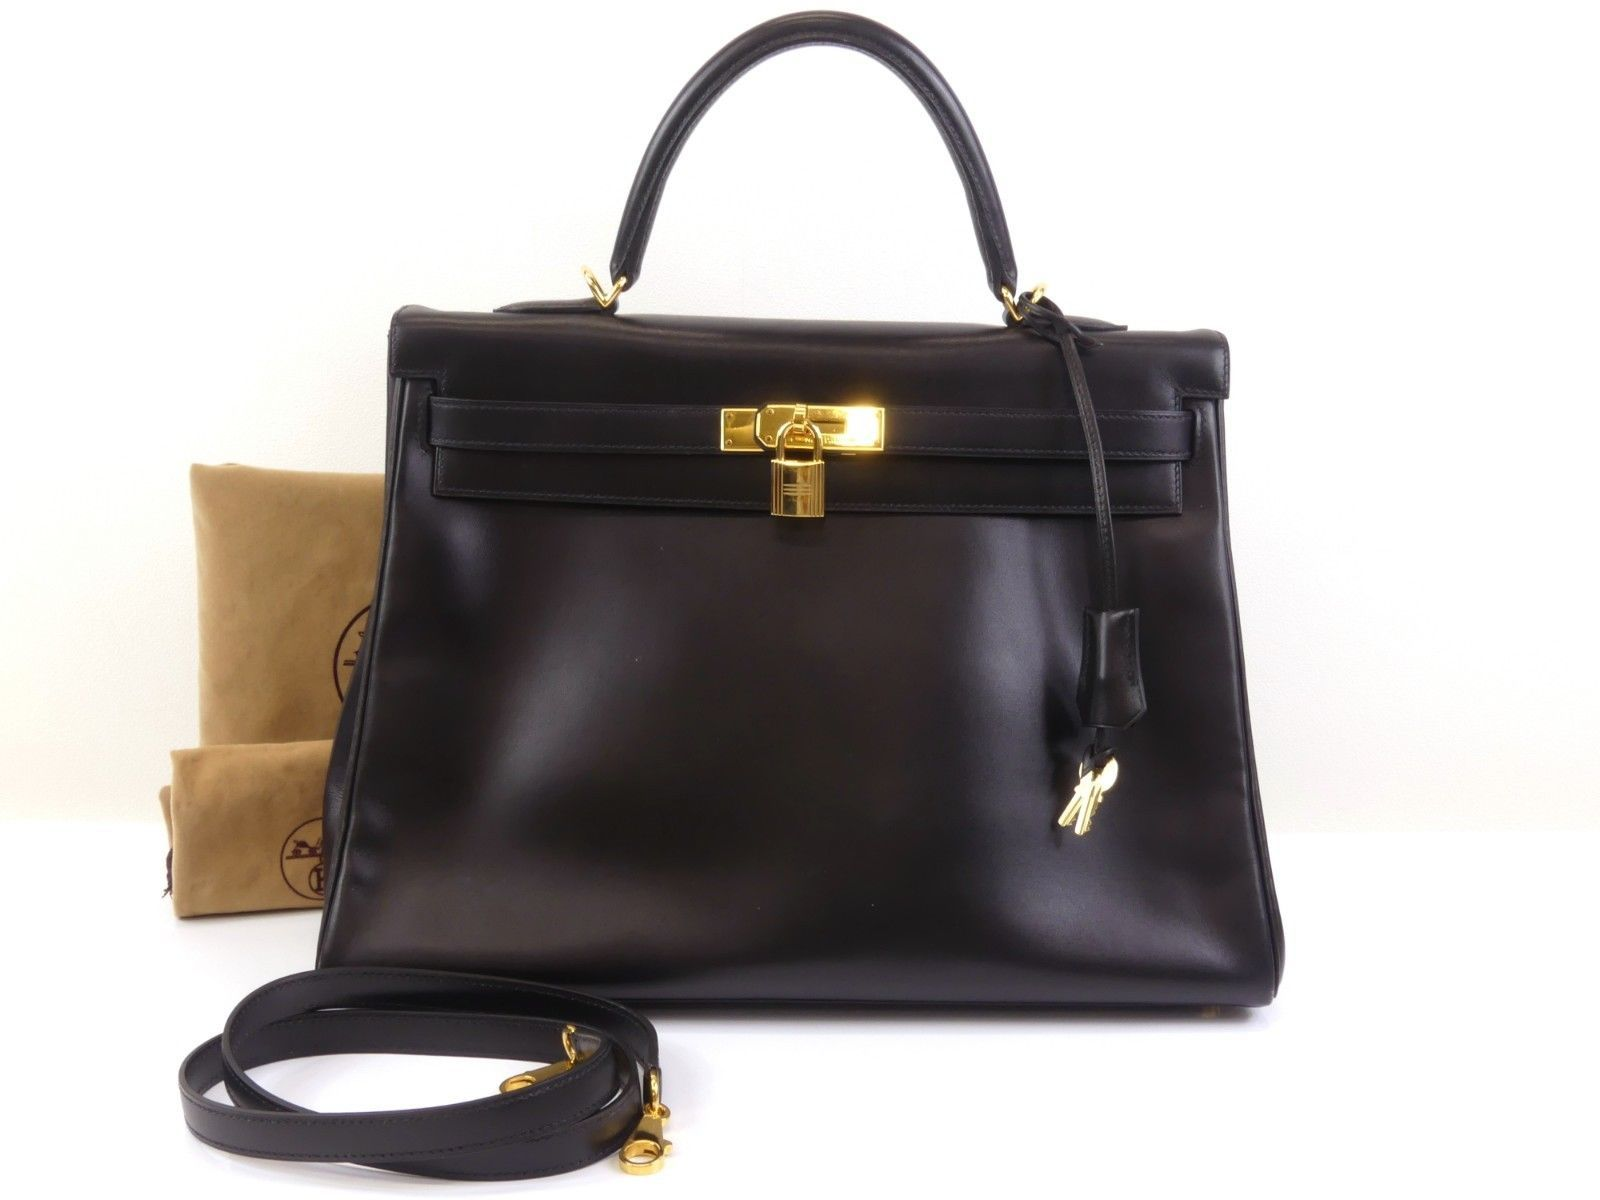 43b32744628 r493 Auth HERMES KELLY 35 In Stitch Black Box Calf Leather 2 Way Hand Bag □F